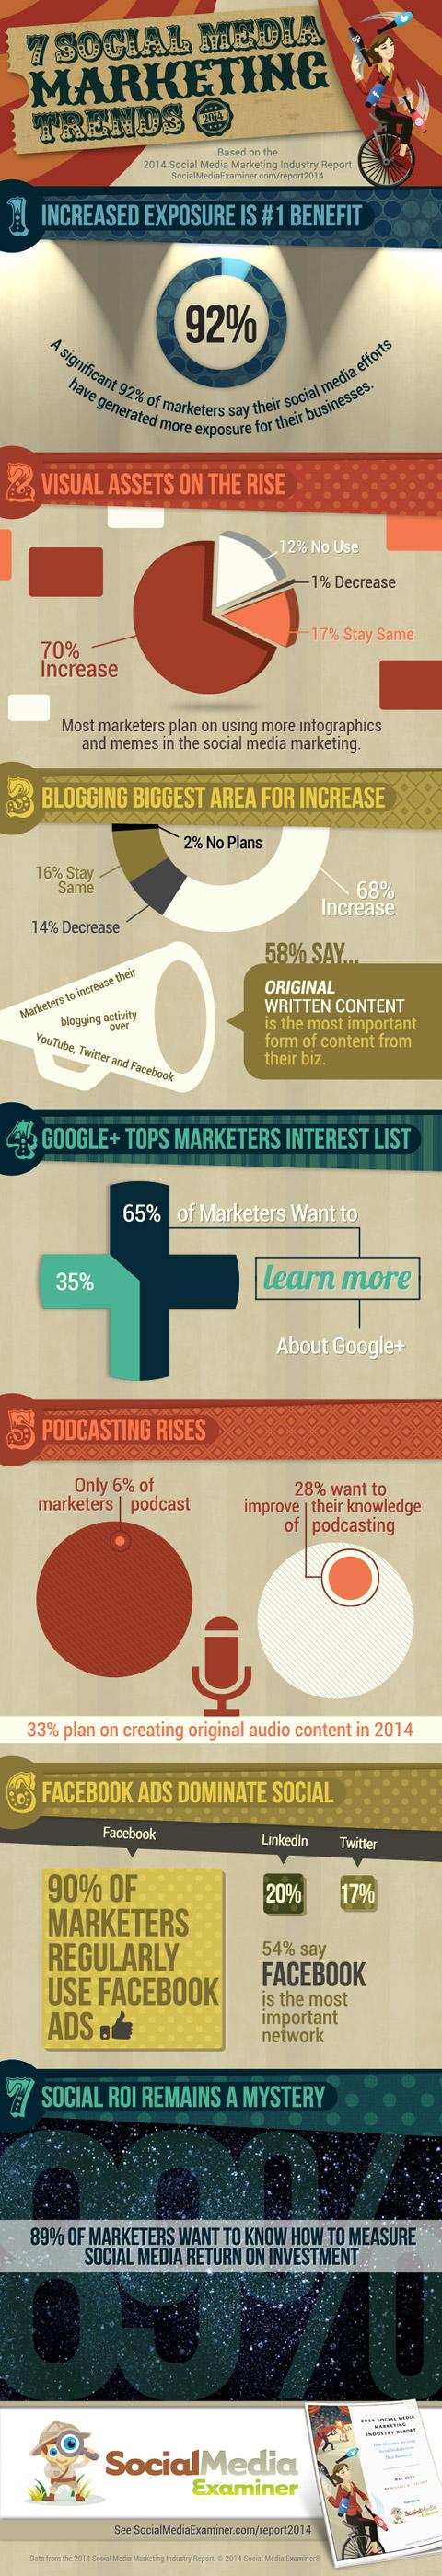 Social Media Prüfer Marketing Trends Infografik